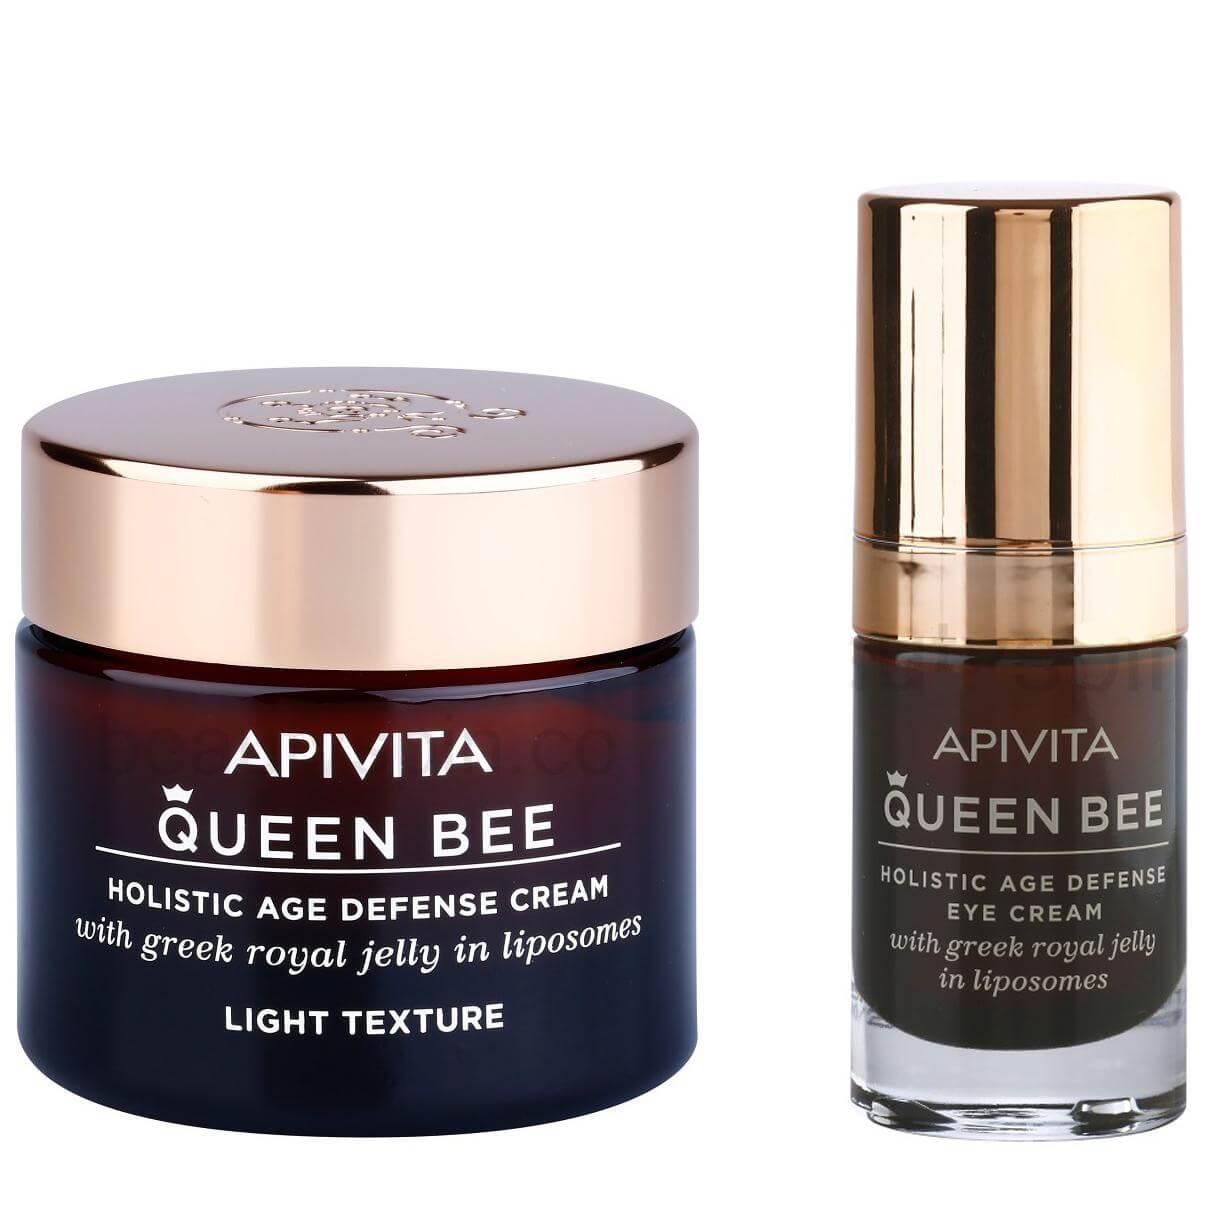 Apivita Πακέτο Προσφοράς Queen Bee Light Cream Kρέμα Ημέρας Ελαφριάς Υφής 50ml & σετ   εκπτώσεις νοεμβρίου 2016